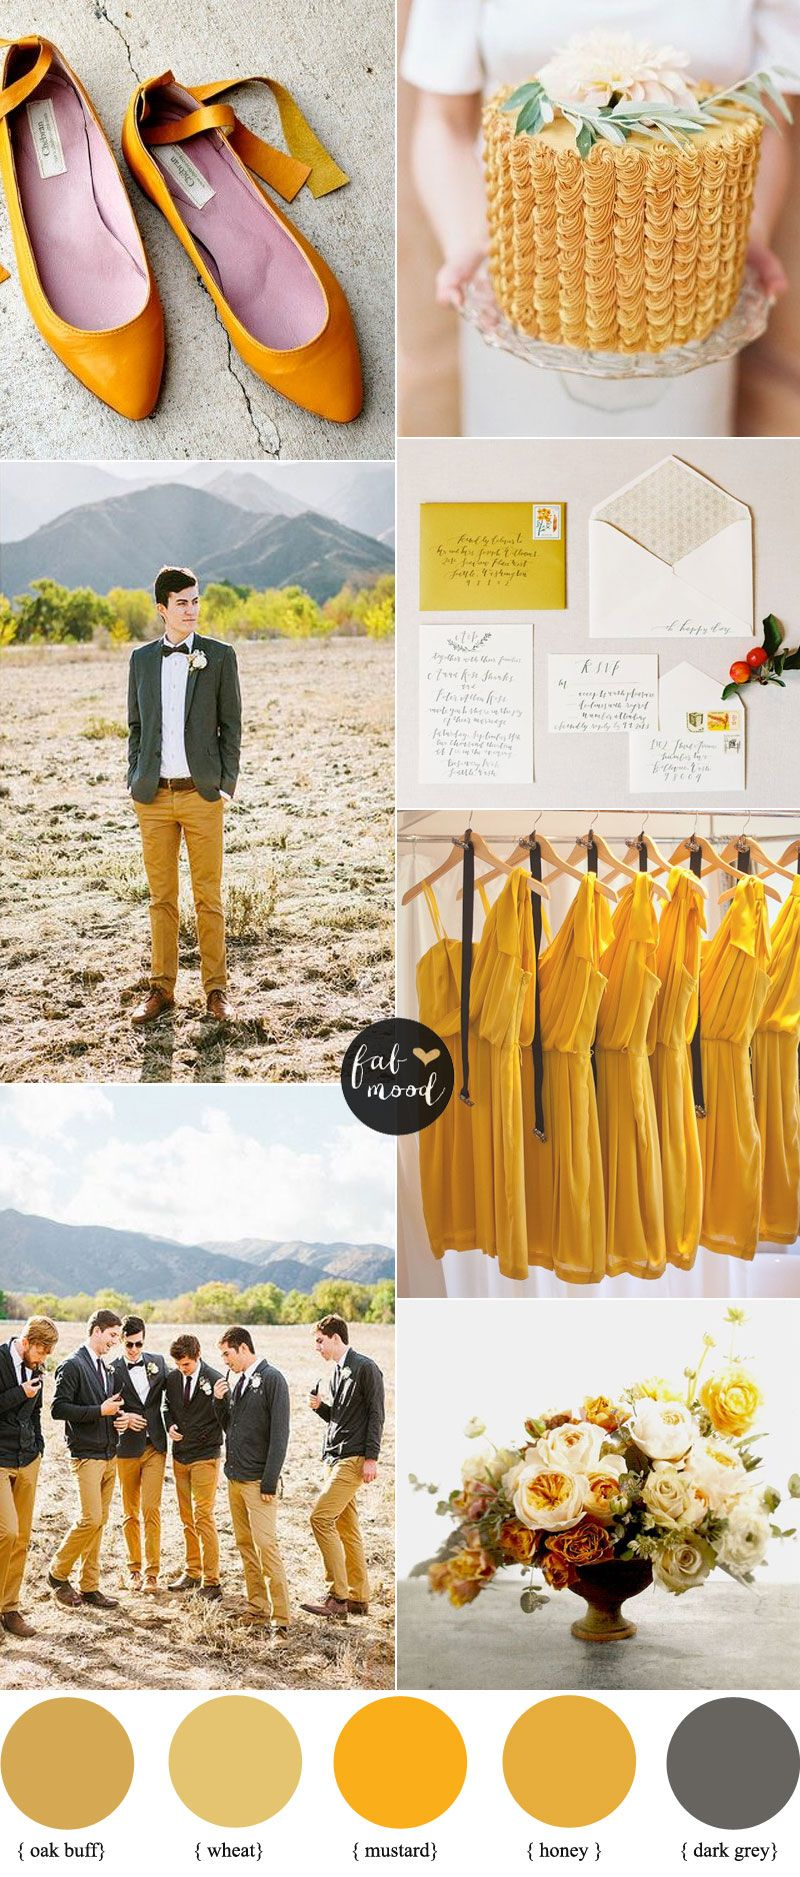 279e3cba85e47c Oak Buff , Mustard and Grey Wedding | Pantone Fall 2015 inspired |  fabmood.co.uk #weddingcolours #weddingtheme #wedding